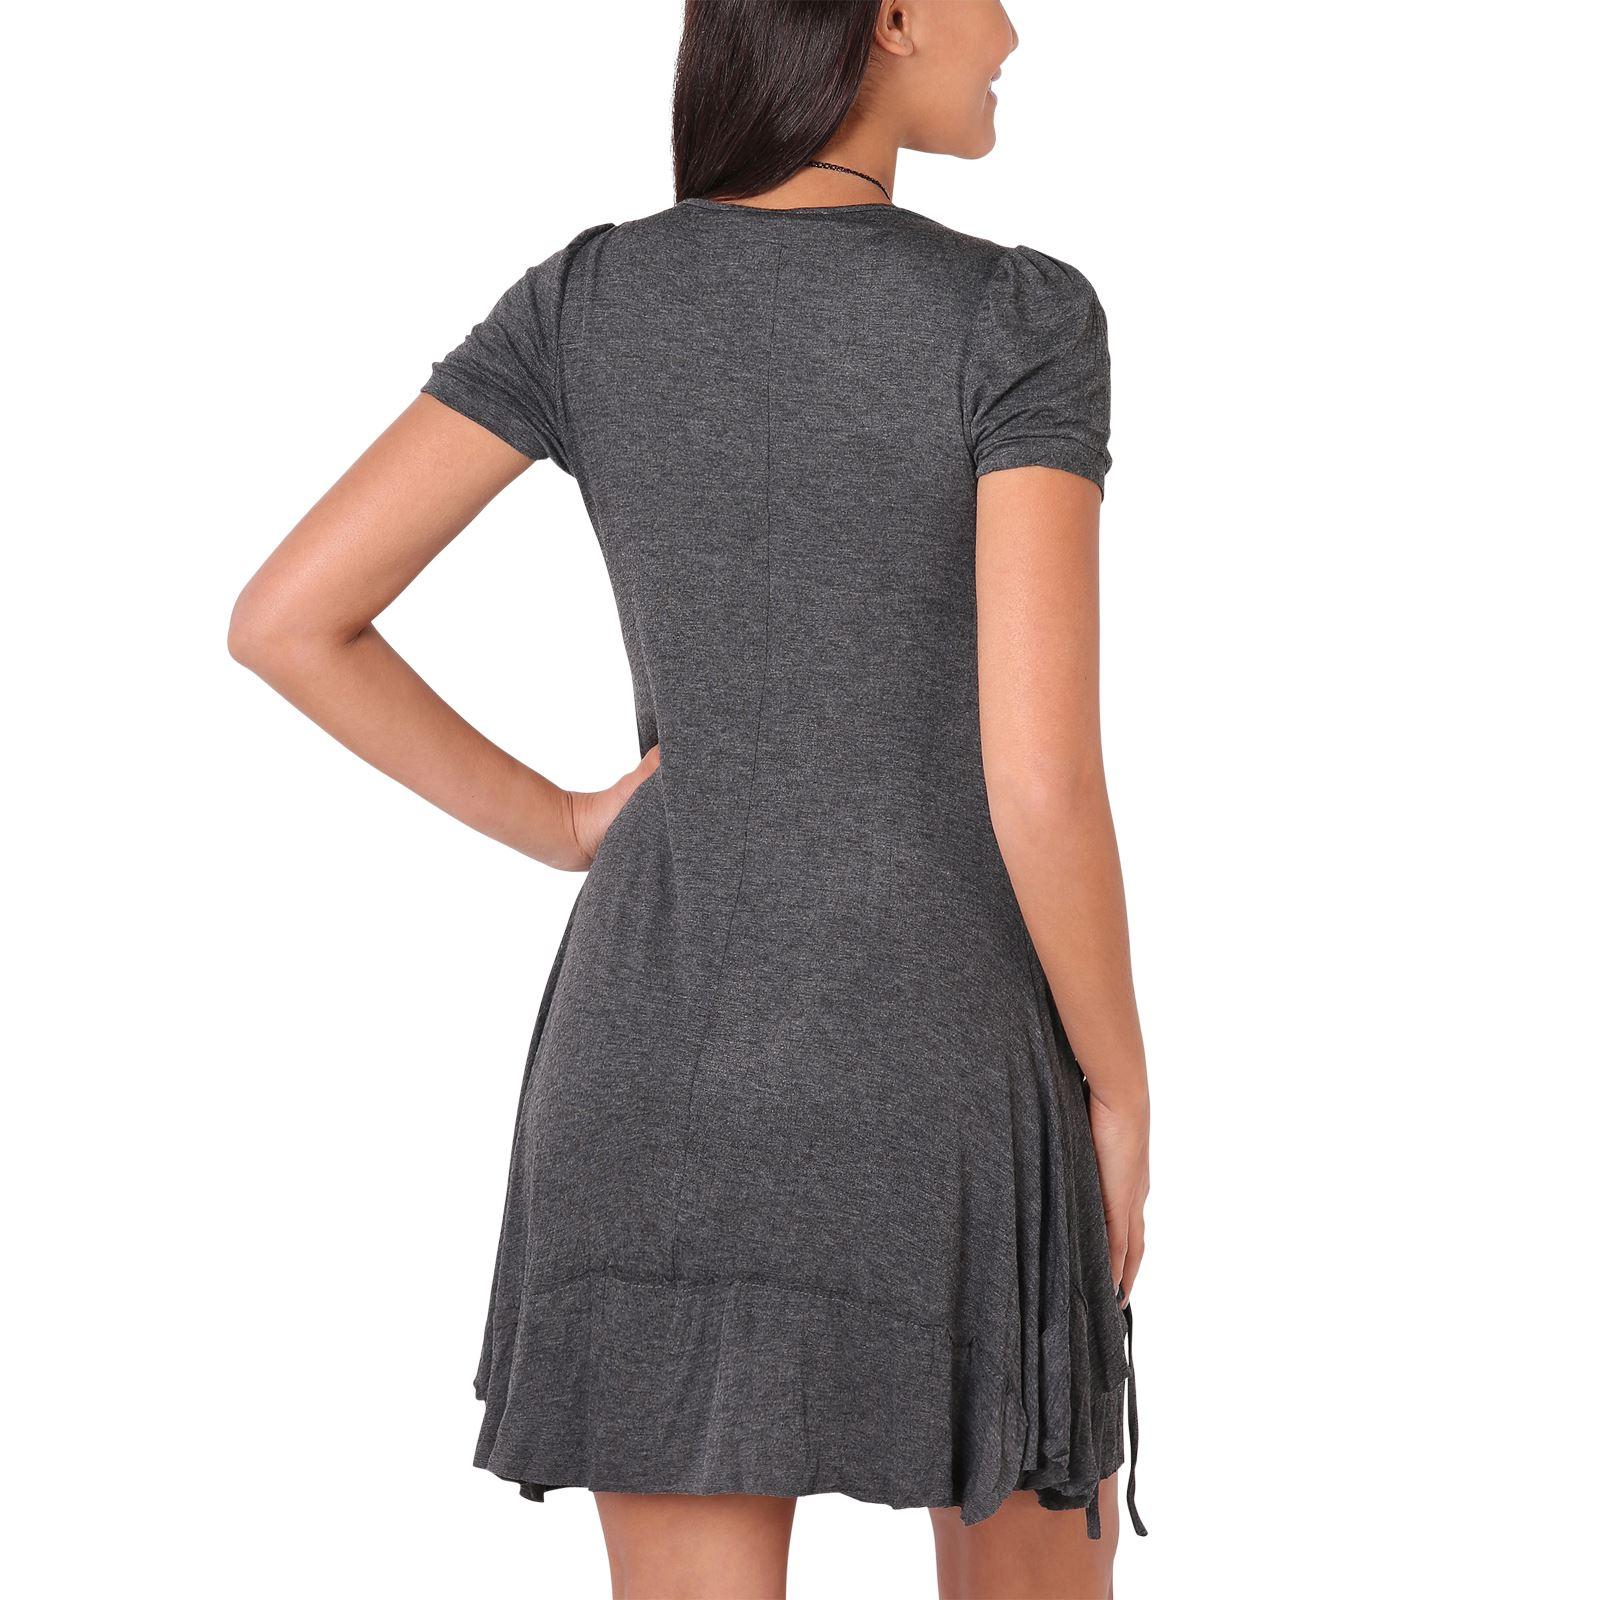 KRISP-Women-2-in-1-Boho-Gypsy-Tunic-Dress-Top-Tee-Jersey-Pleated-A-Line-Necklace thumbnail 7